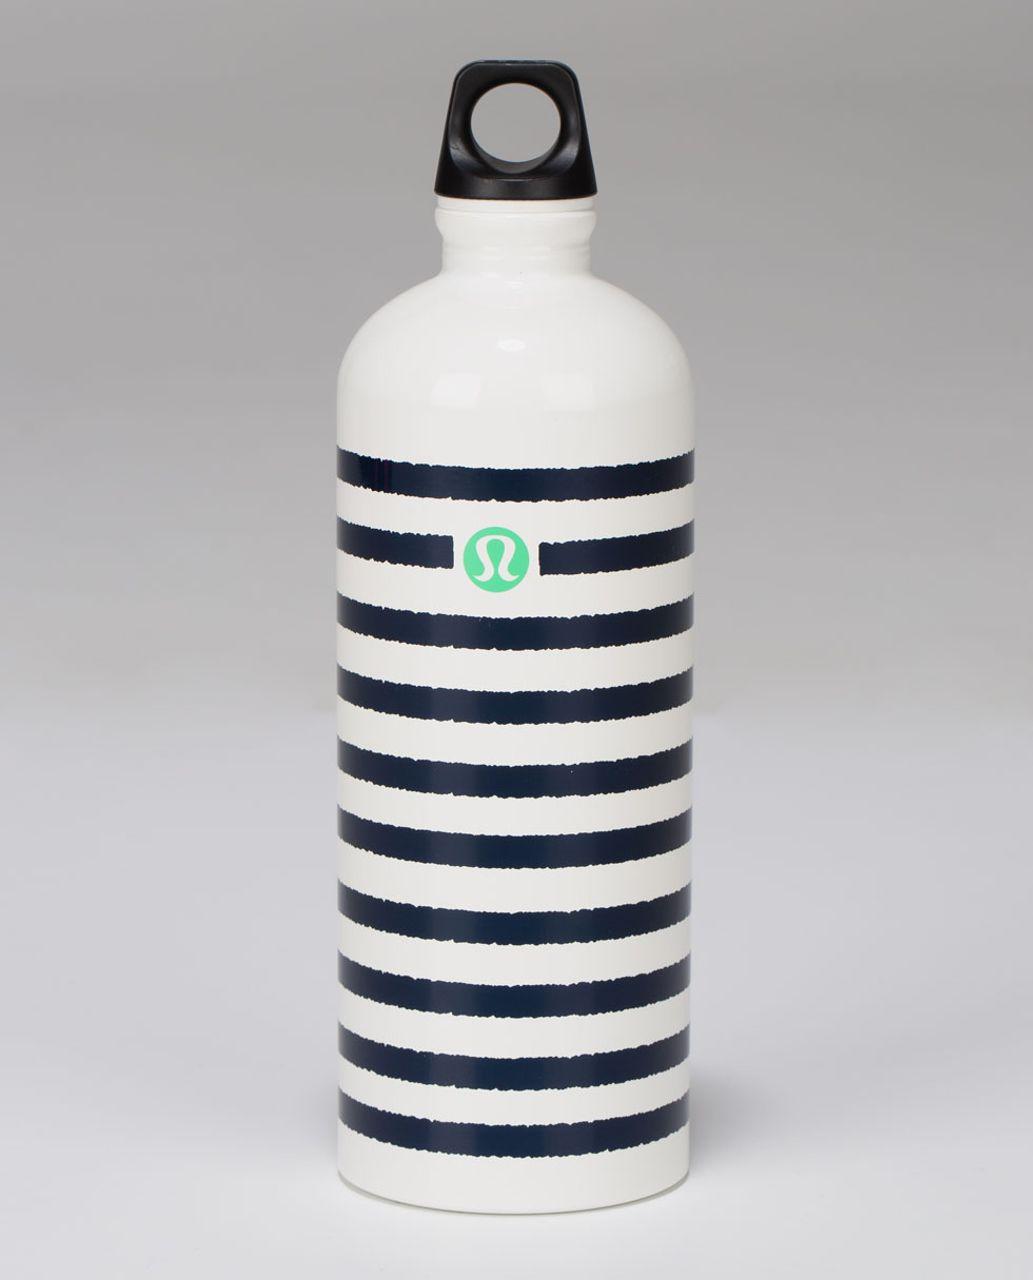 be2932e33f Lululemon Sigg 1l Water Bottle Yoga Is My Anchor Cadet Blue Lulu